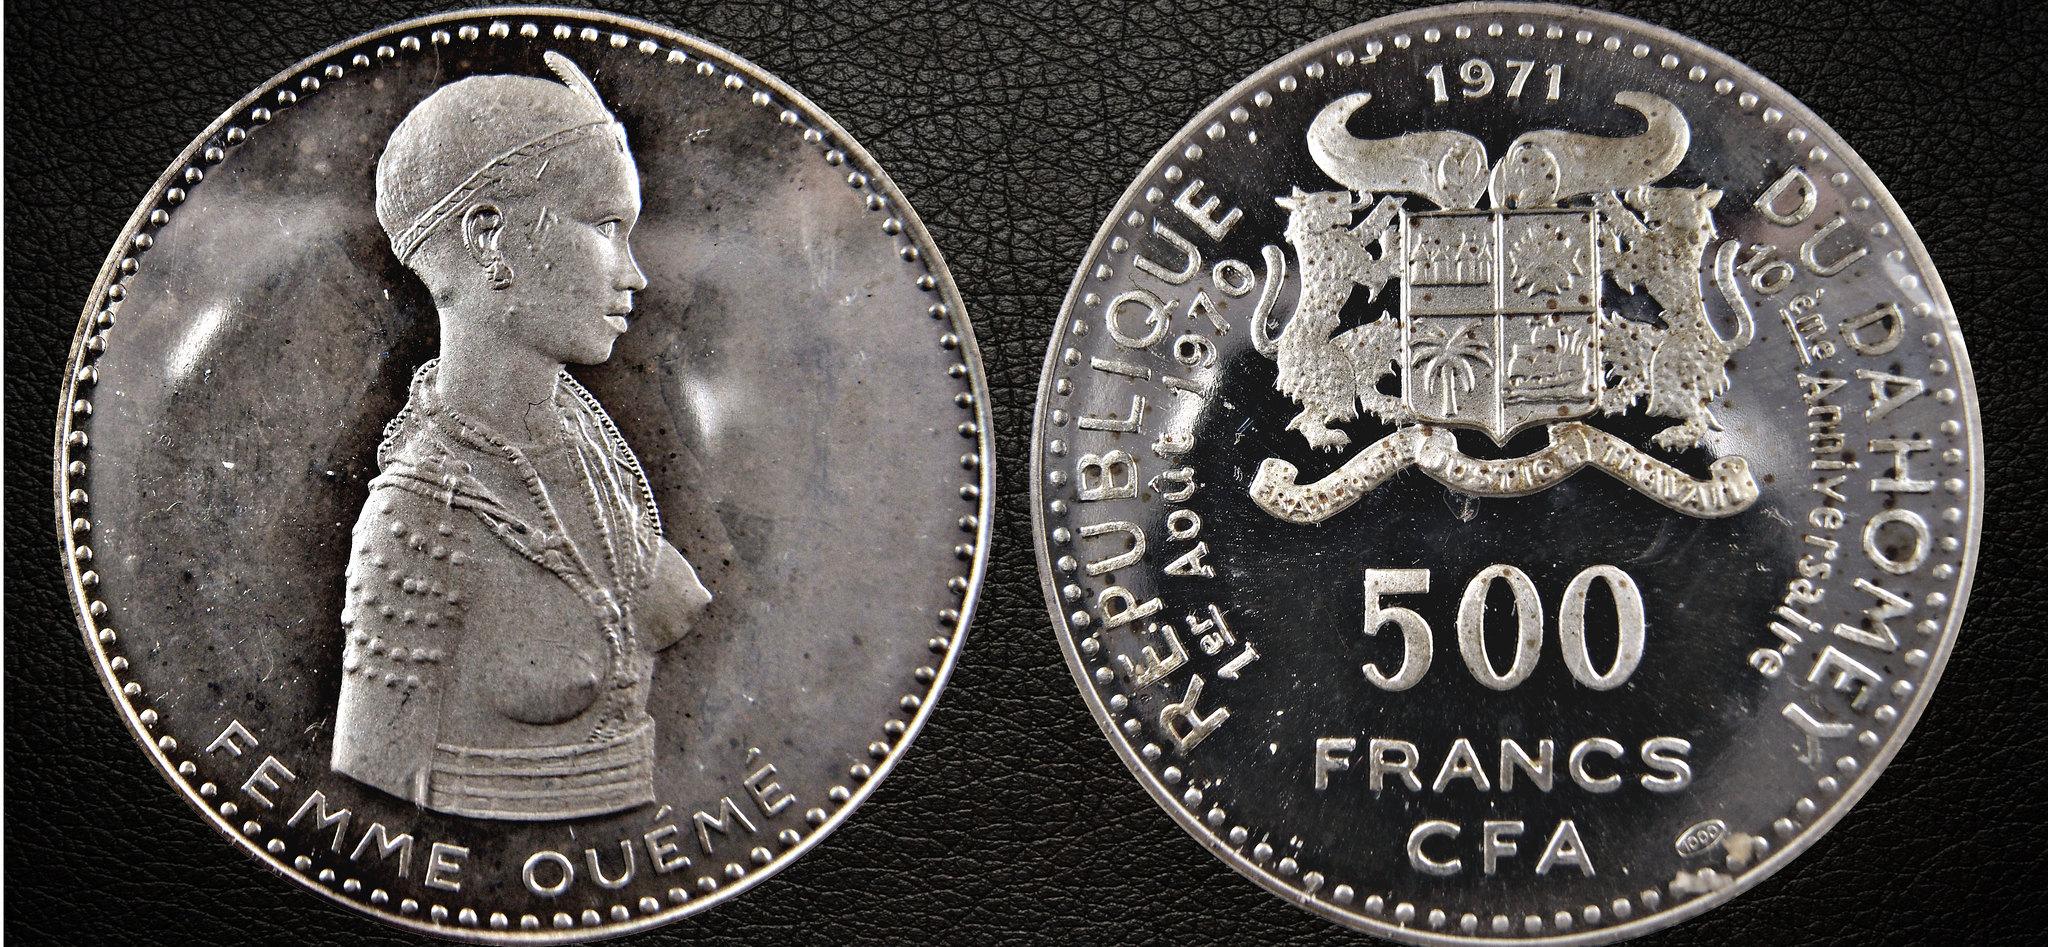 500 FRANCS 1971 - REPUBLICA DE DAHOMEY - 10º ANIVERSARIO DE LA INDEPENDENCIA 16320422545_677eac7a81_k